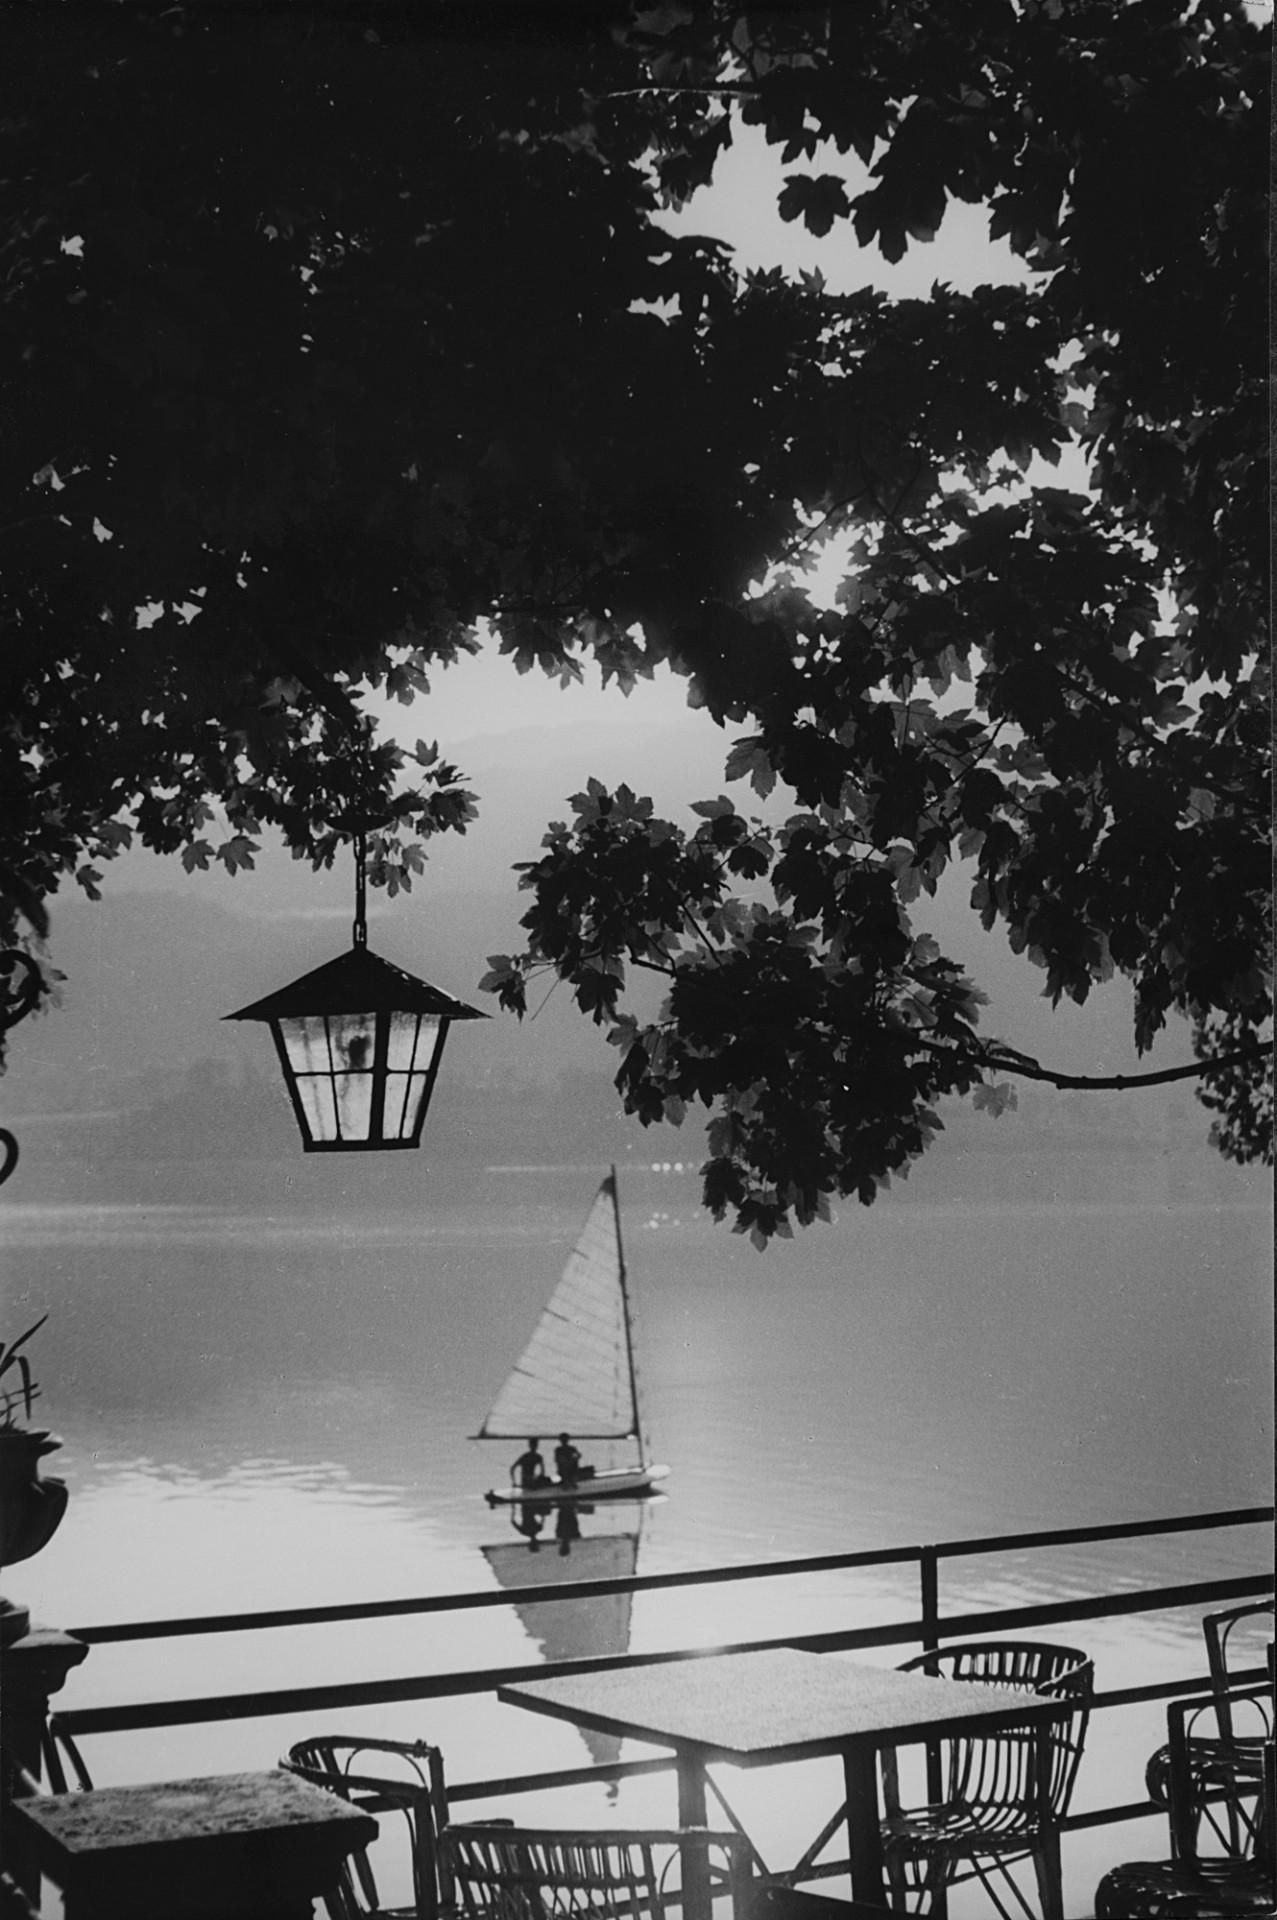 На озере, 1947. Фотограф Риккардо Монкальво